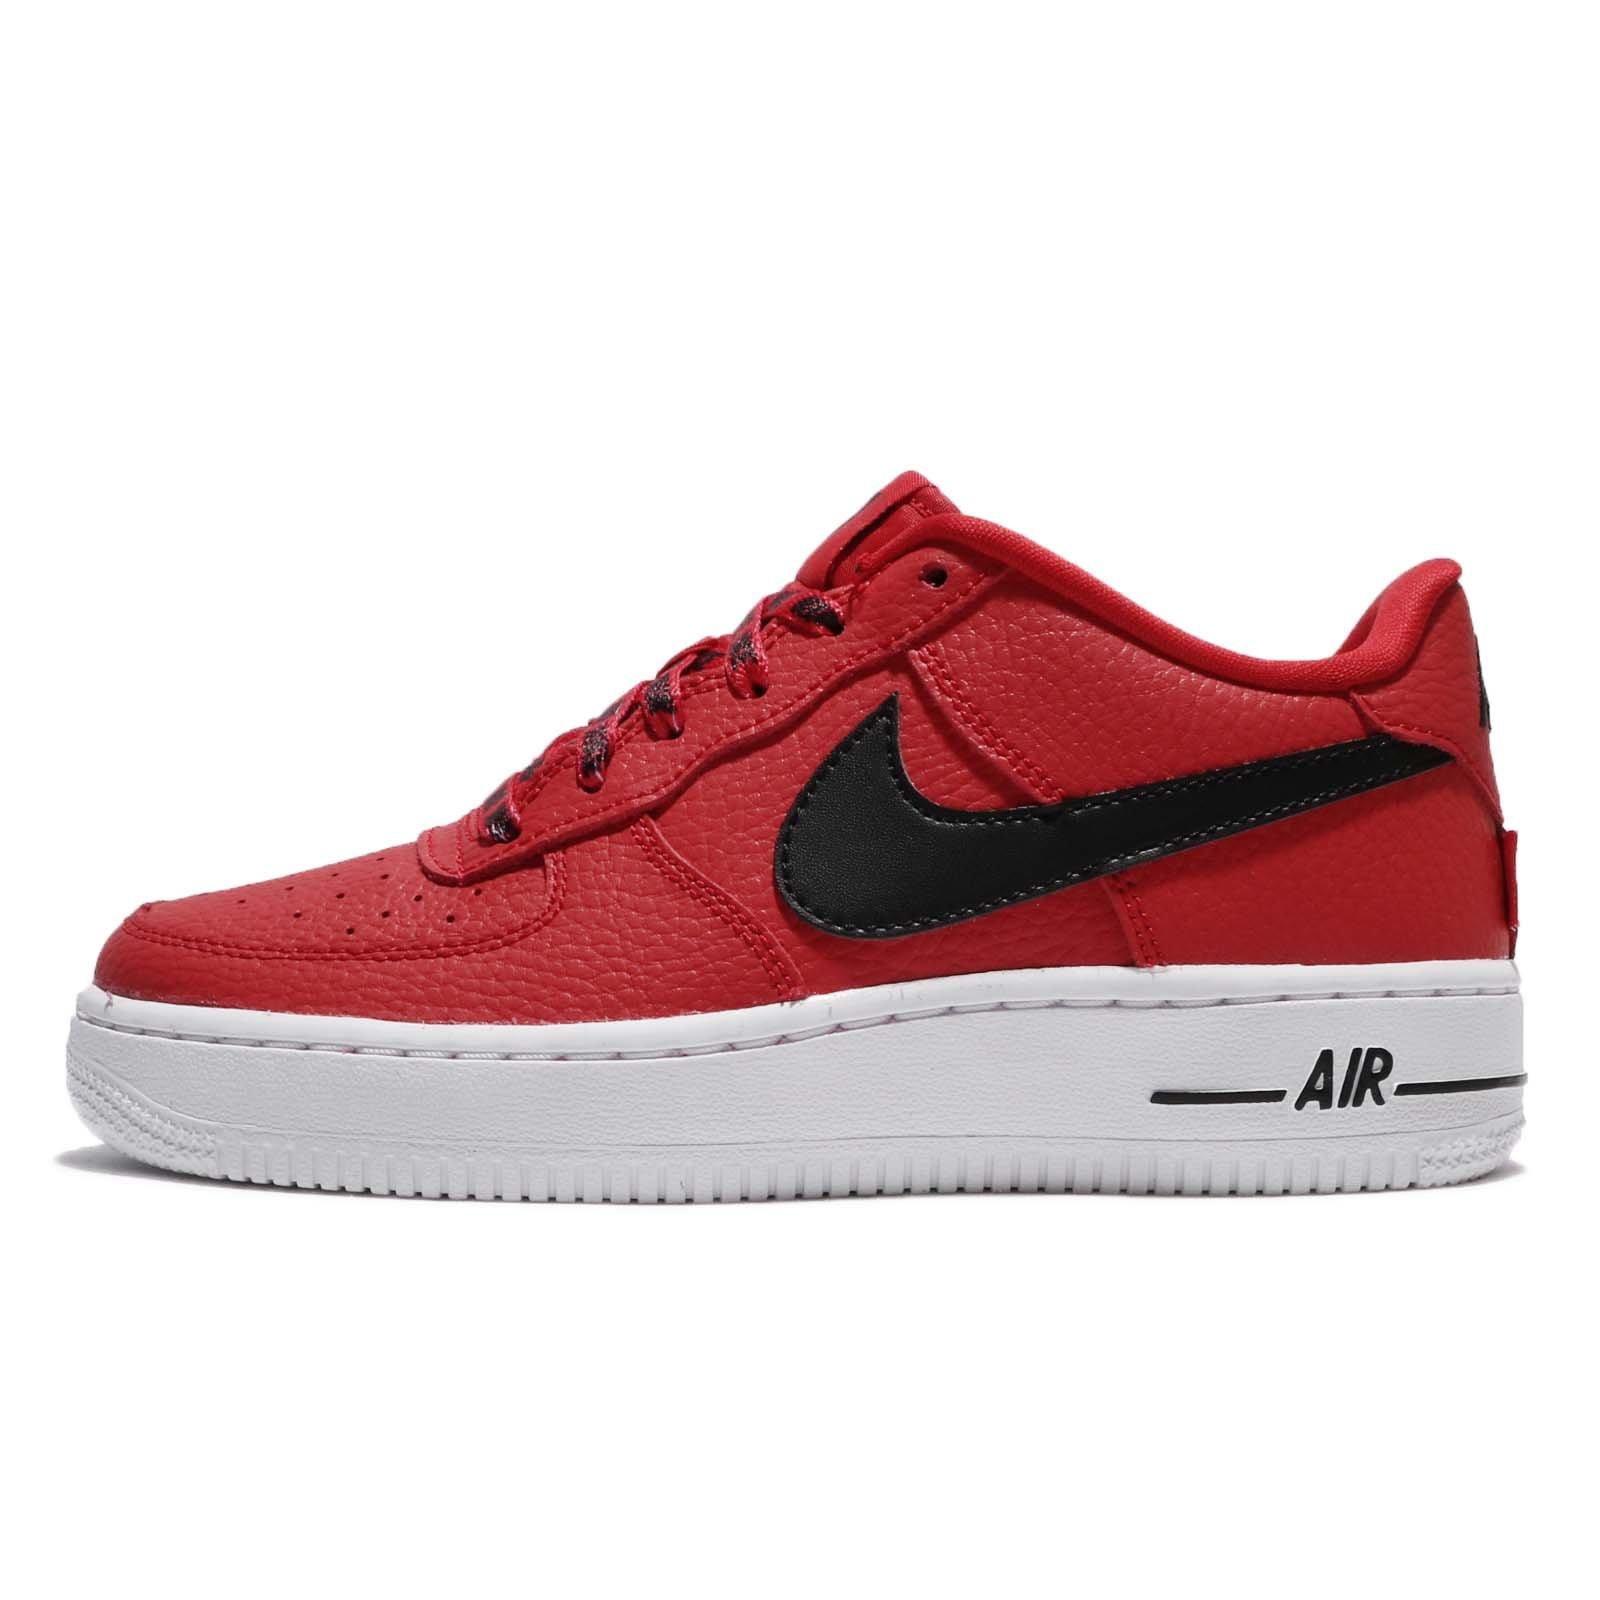 timeless design 8e50f 55e34 Galleon - Nike Air Force 1 Lv8 (gs) Big Kids 820438-606 Size 6.5